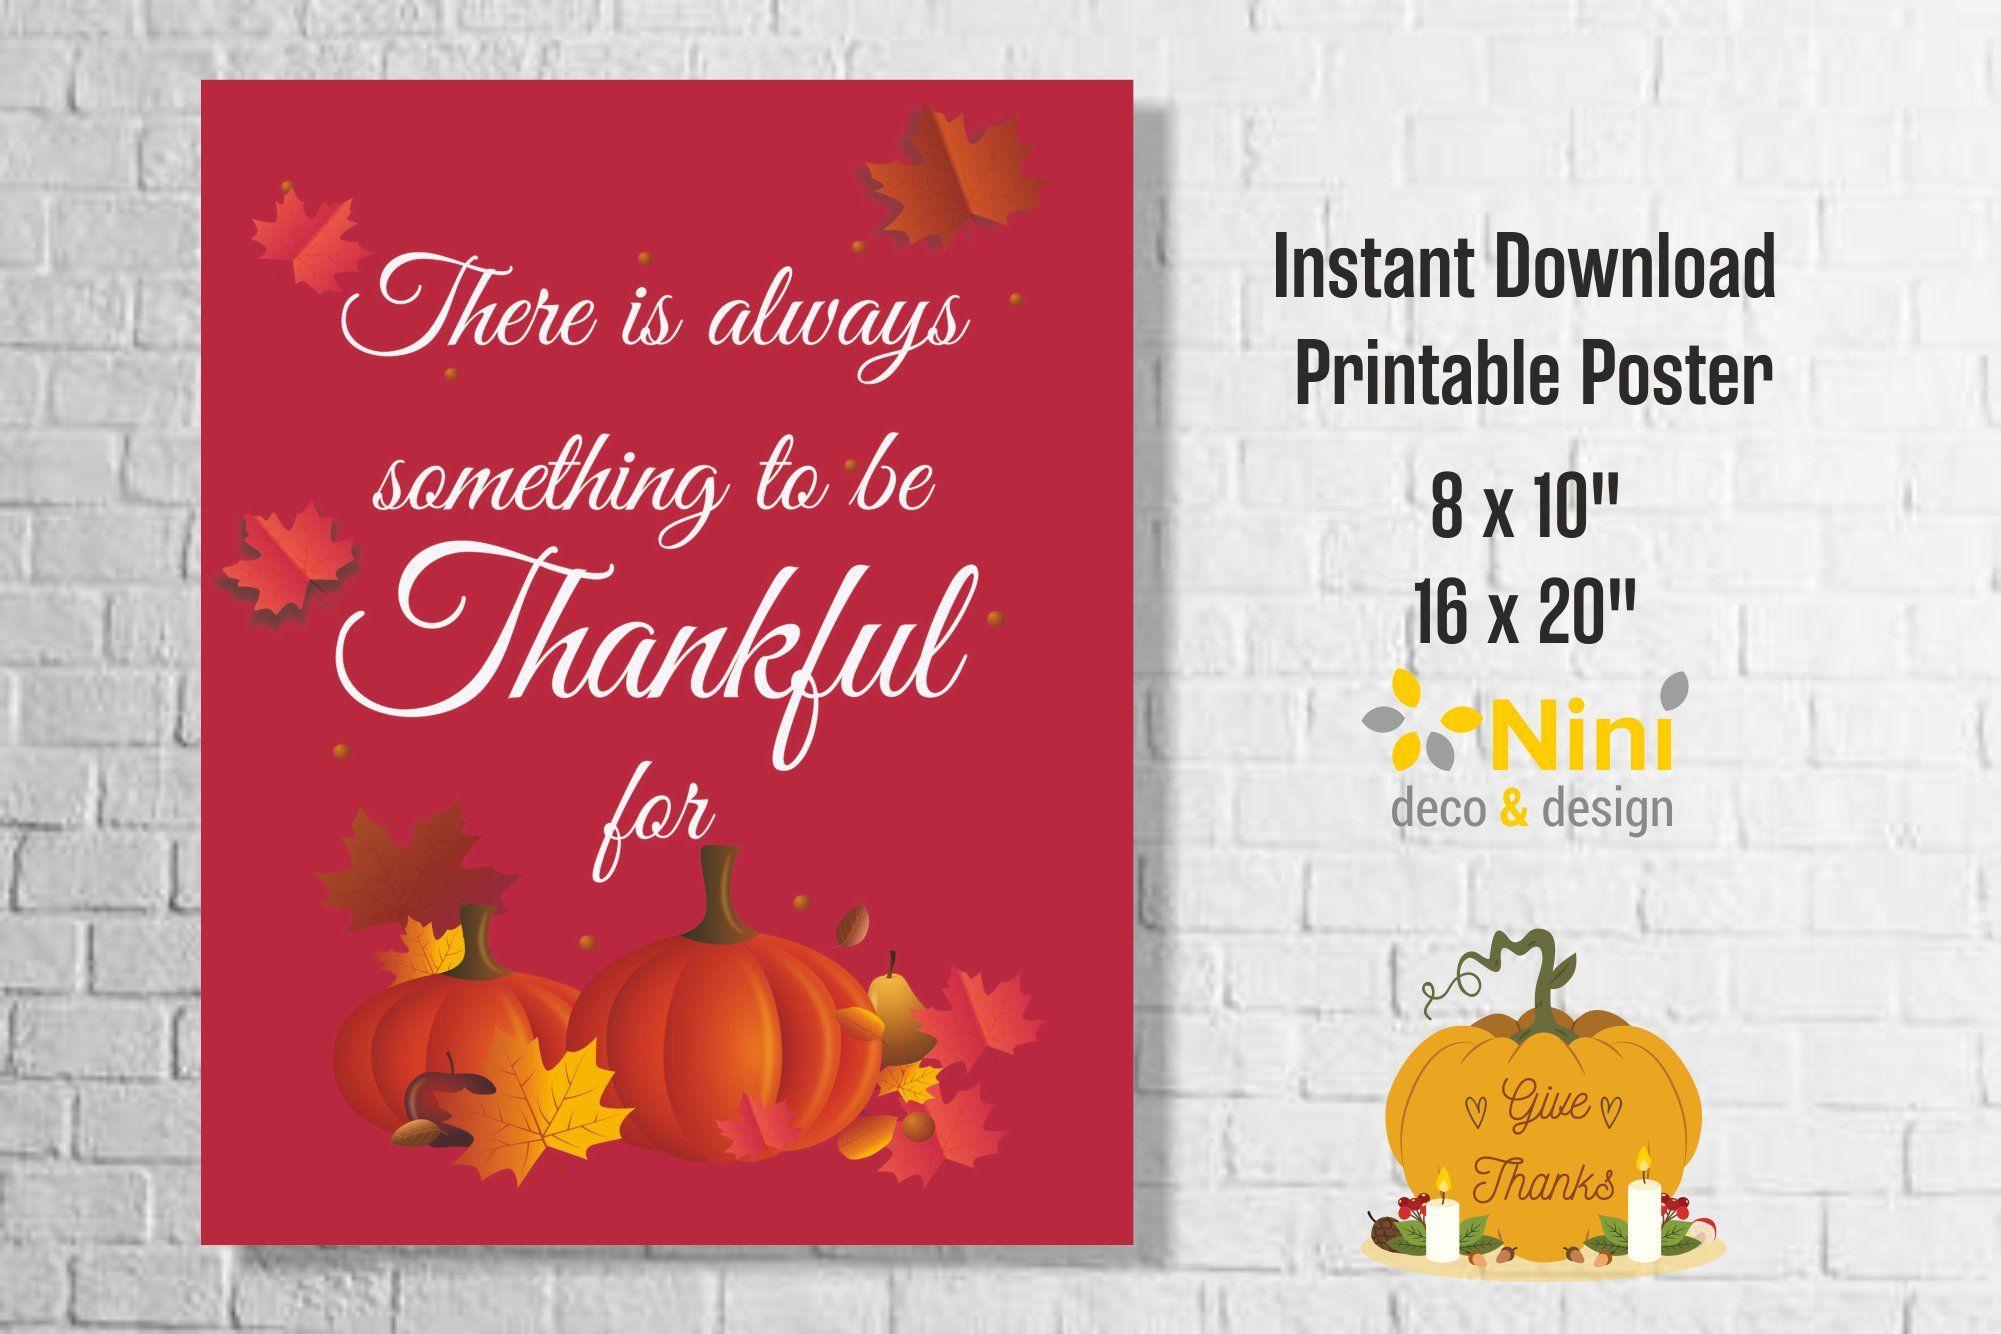 Thanksgiving Poster Printable Thanksgiving Wall Art Bless Food Family Love Sign Pumpkin Sign Thanksgiving Quote Pumpkin Thanksgiving Sign Imprimible Accion De Gracias Poster